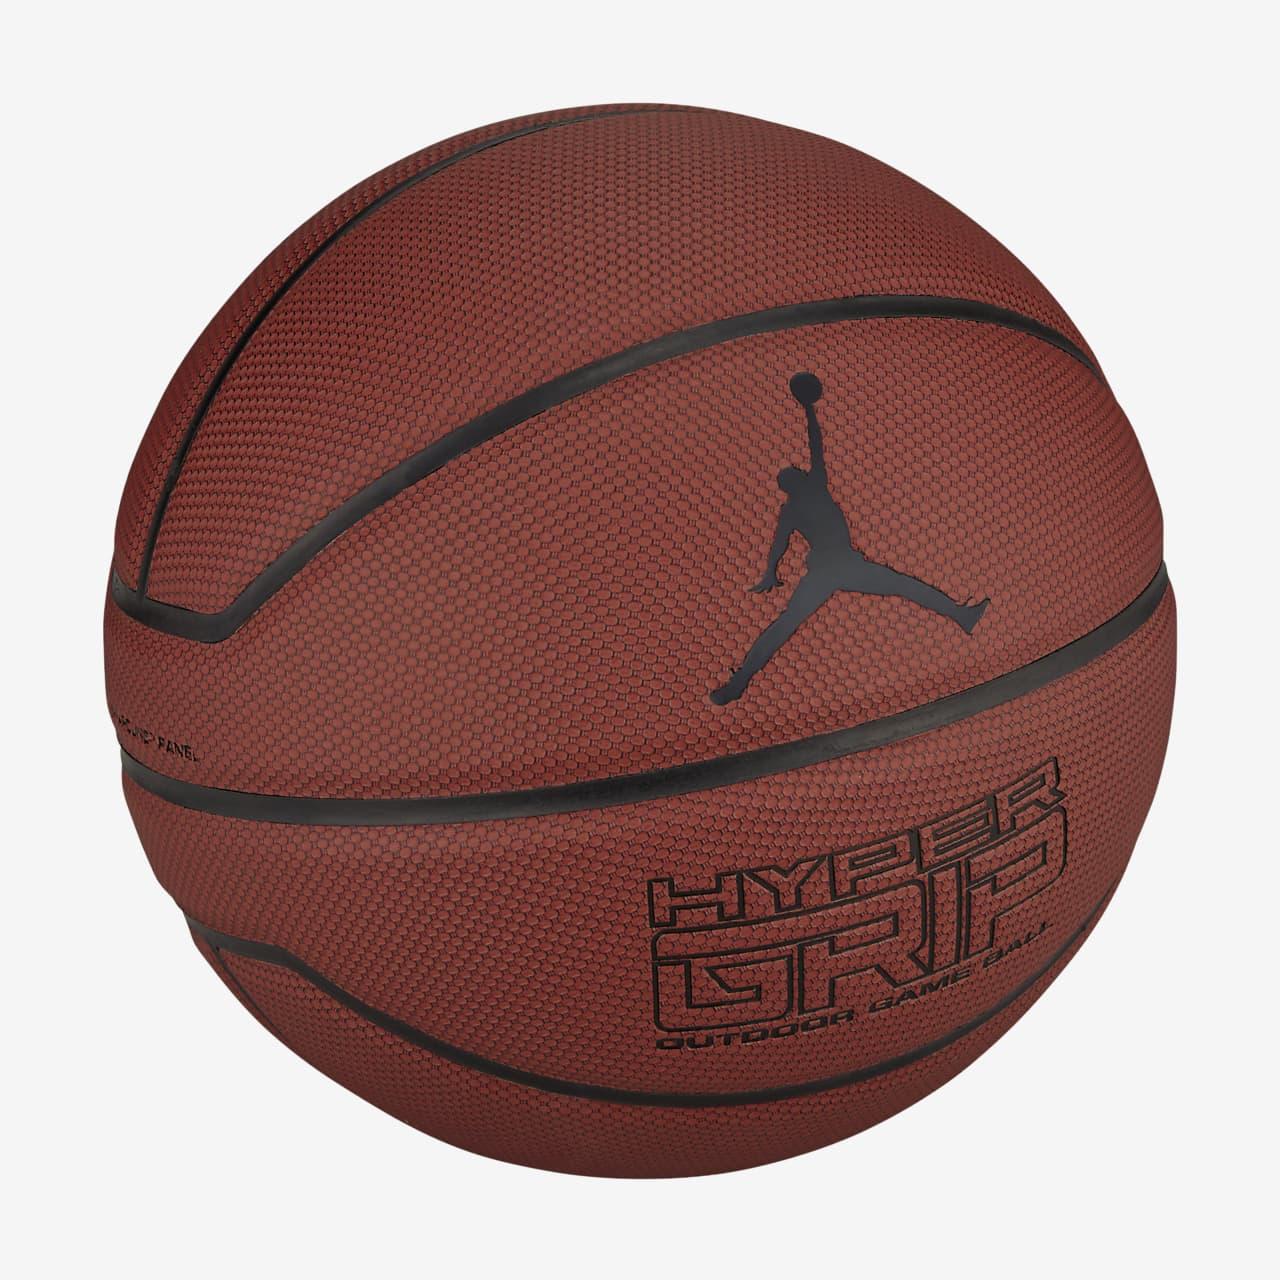 Jordan Hyper Grip 4P (Size 7) Basketball